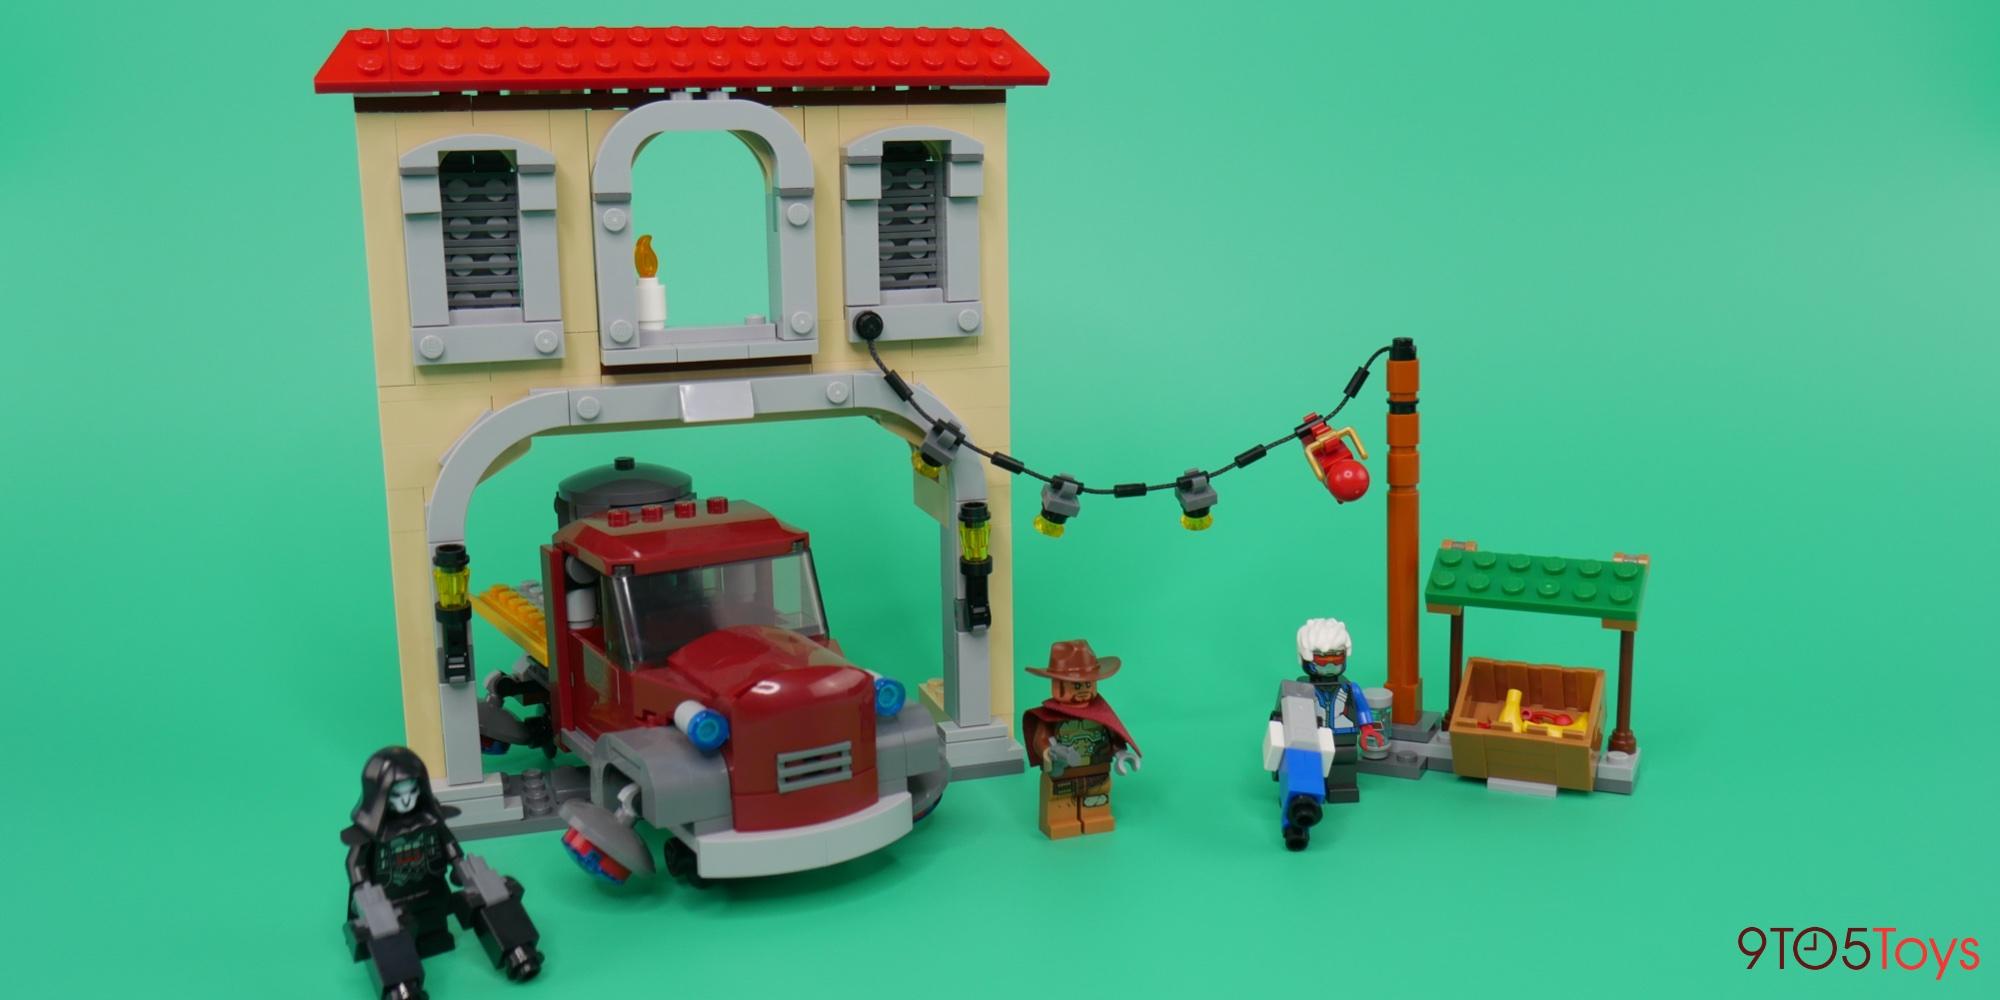 LEGO Overwatch sets